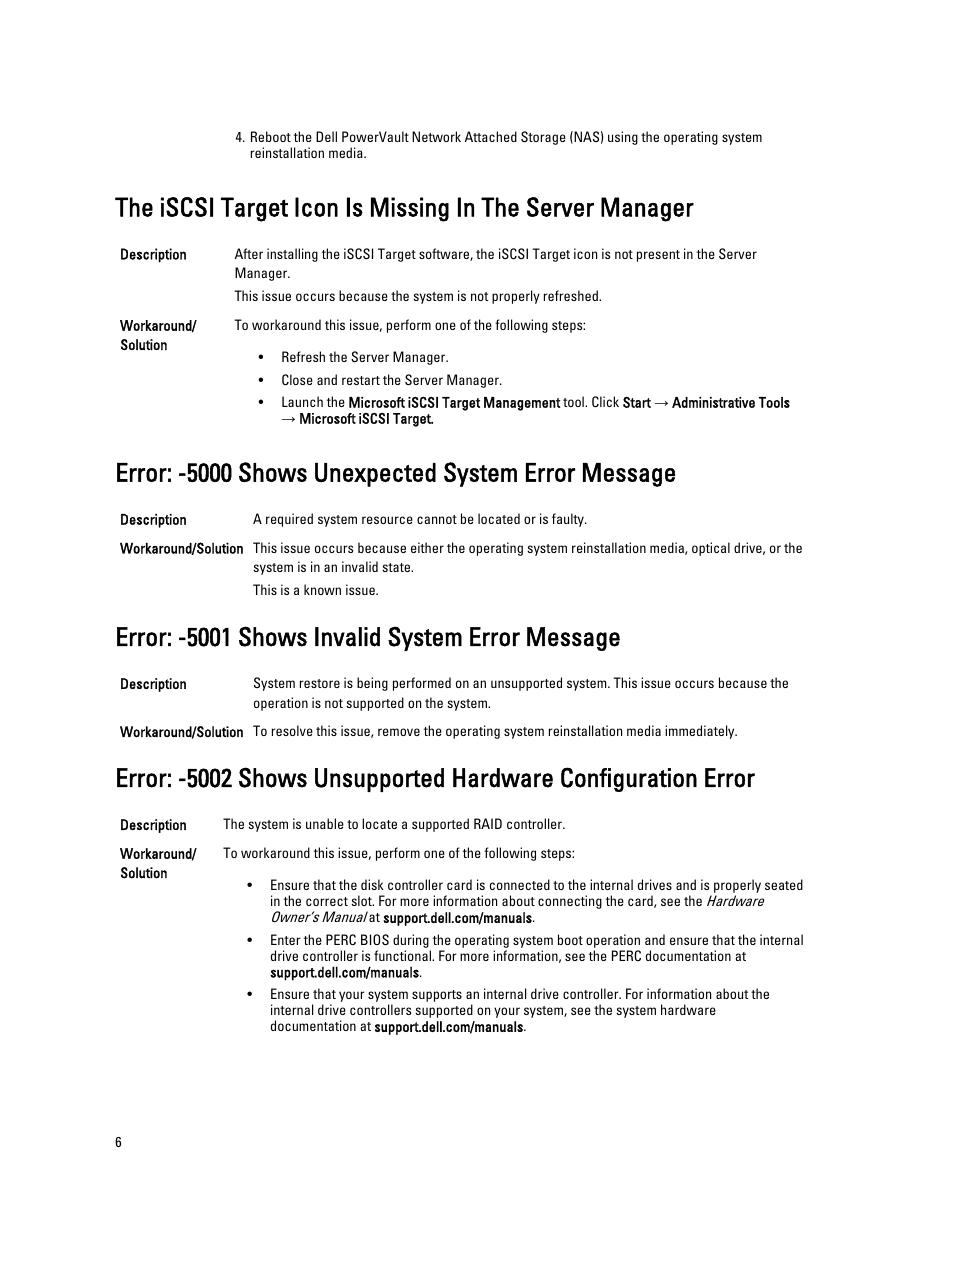 error 5000 shows unexpected system error message error 5001 rh manualsdir com Dell NX-3000 Dell PowerVault Storage